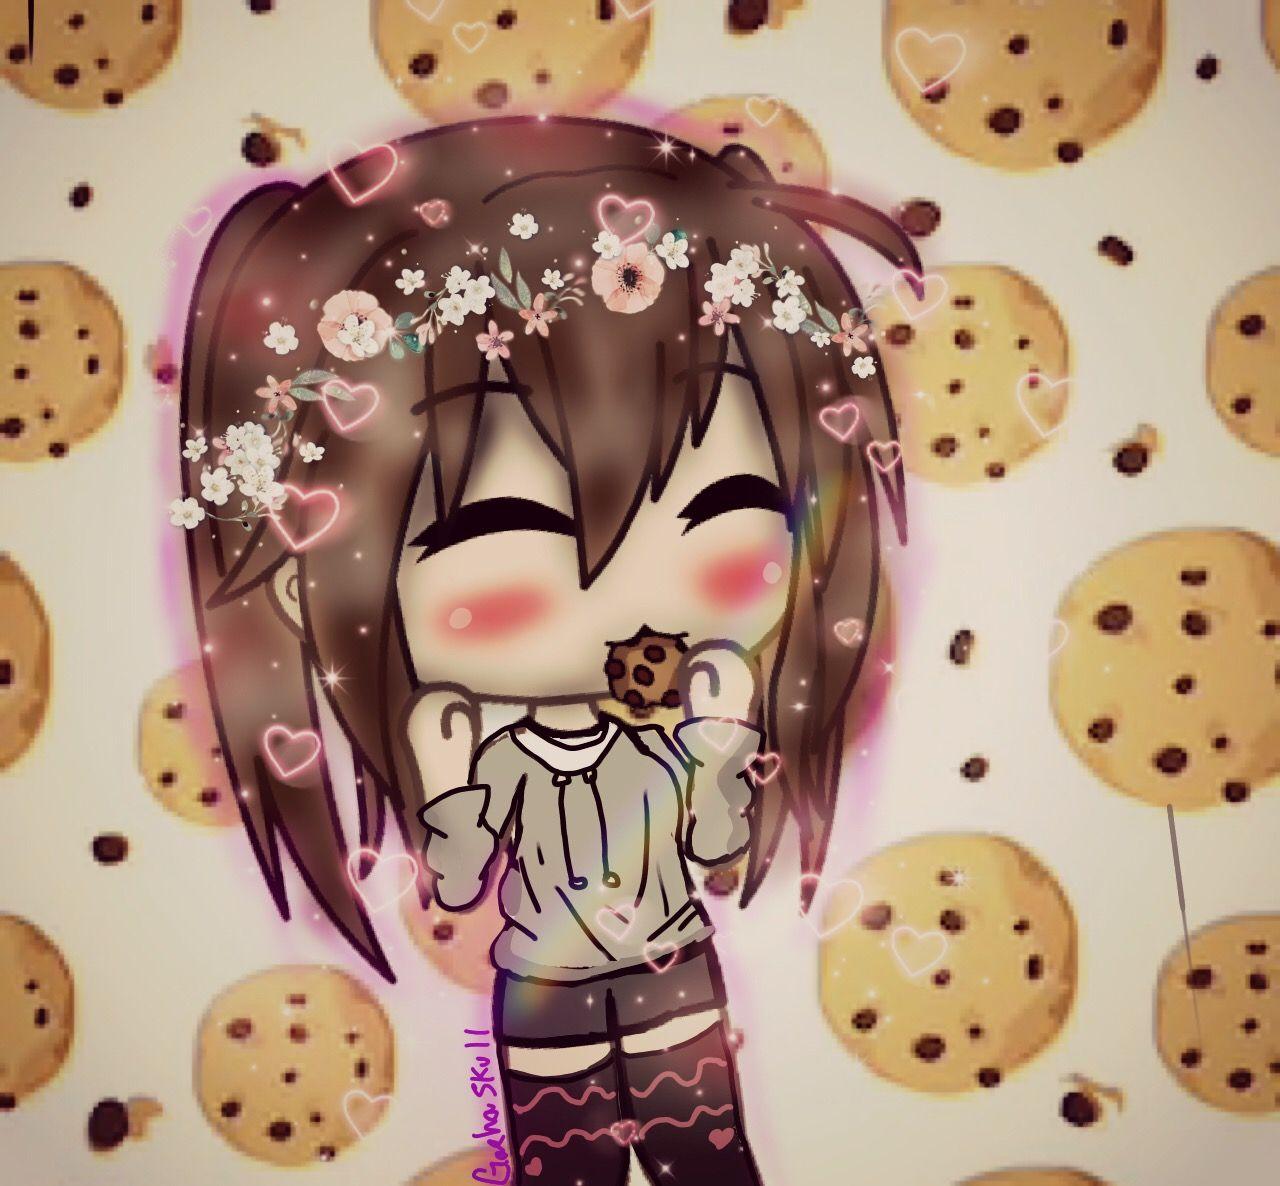 Gacha Life Edit Freetoedit Cookies Cute Anime Chibi Anime Wolf Girl Kawaii Drawings